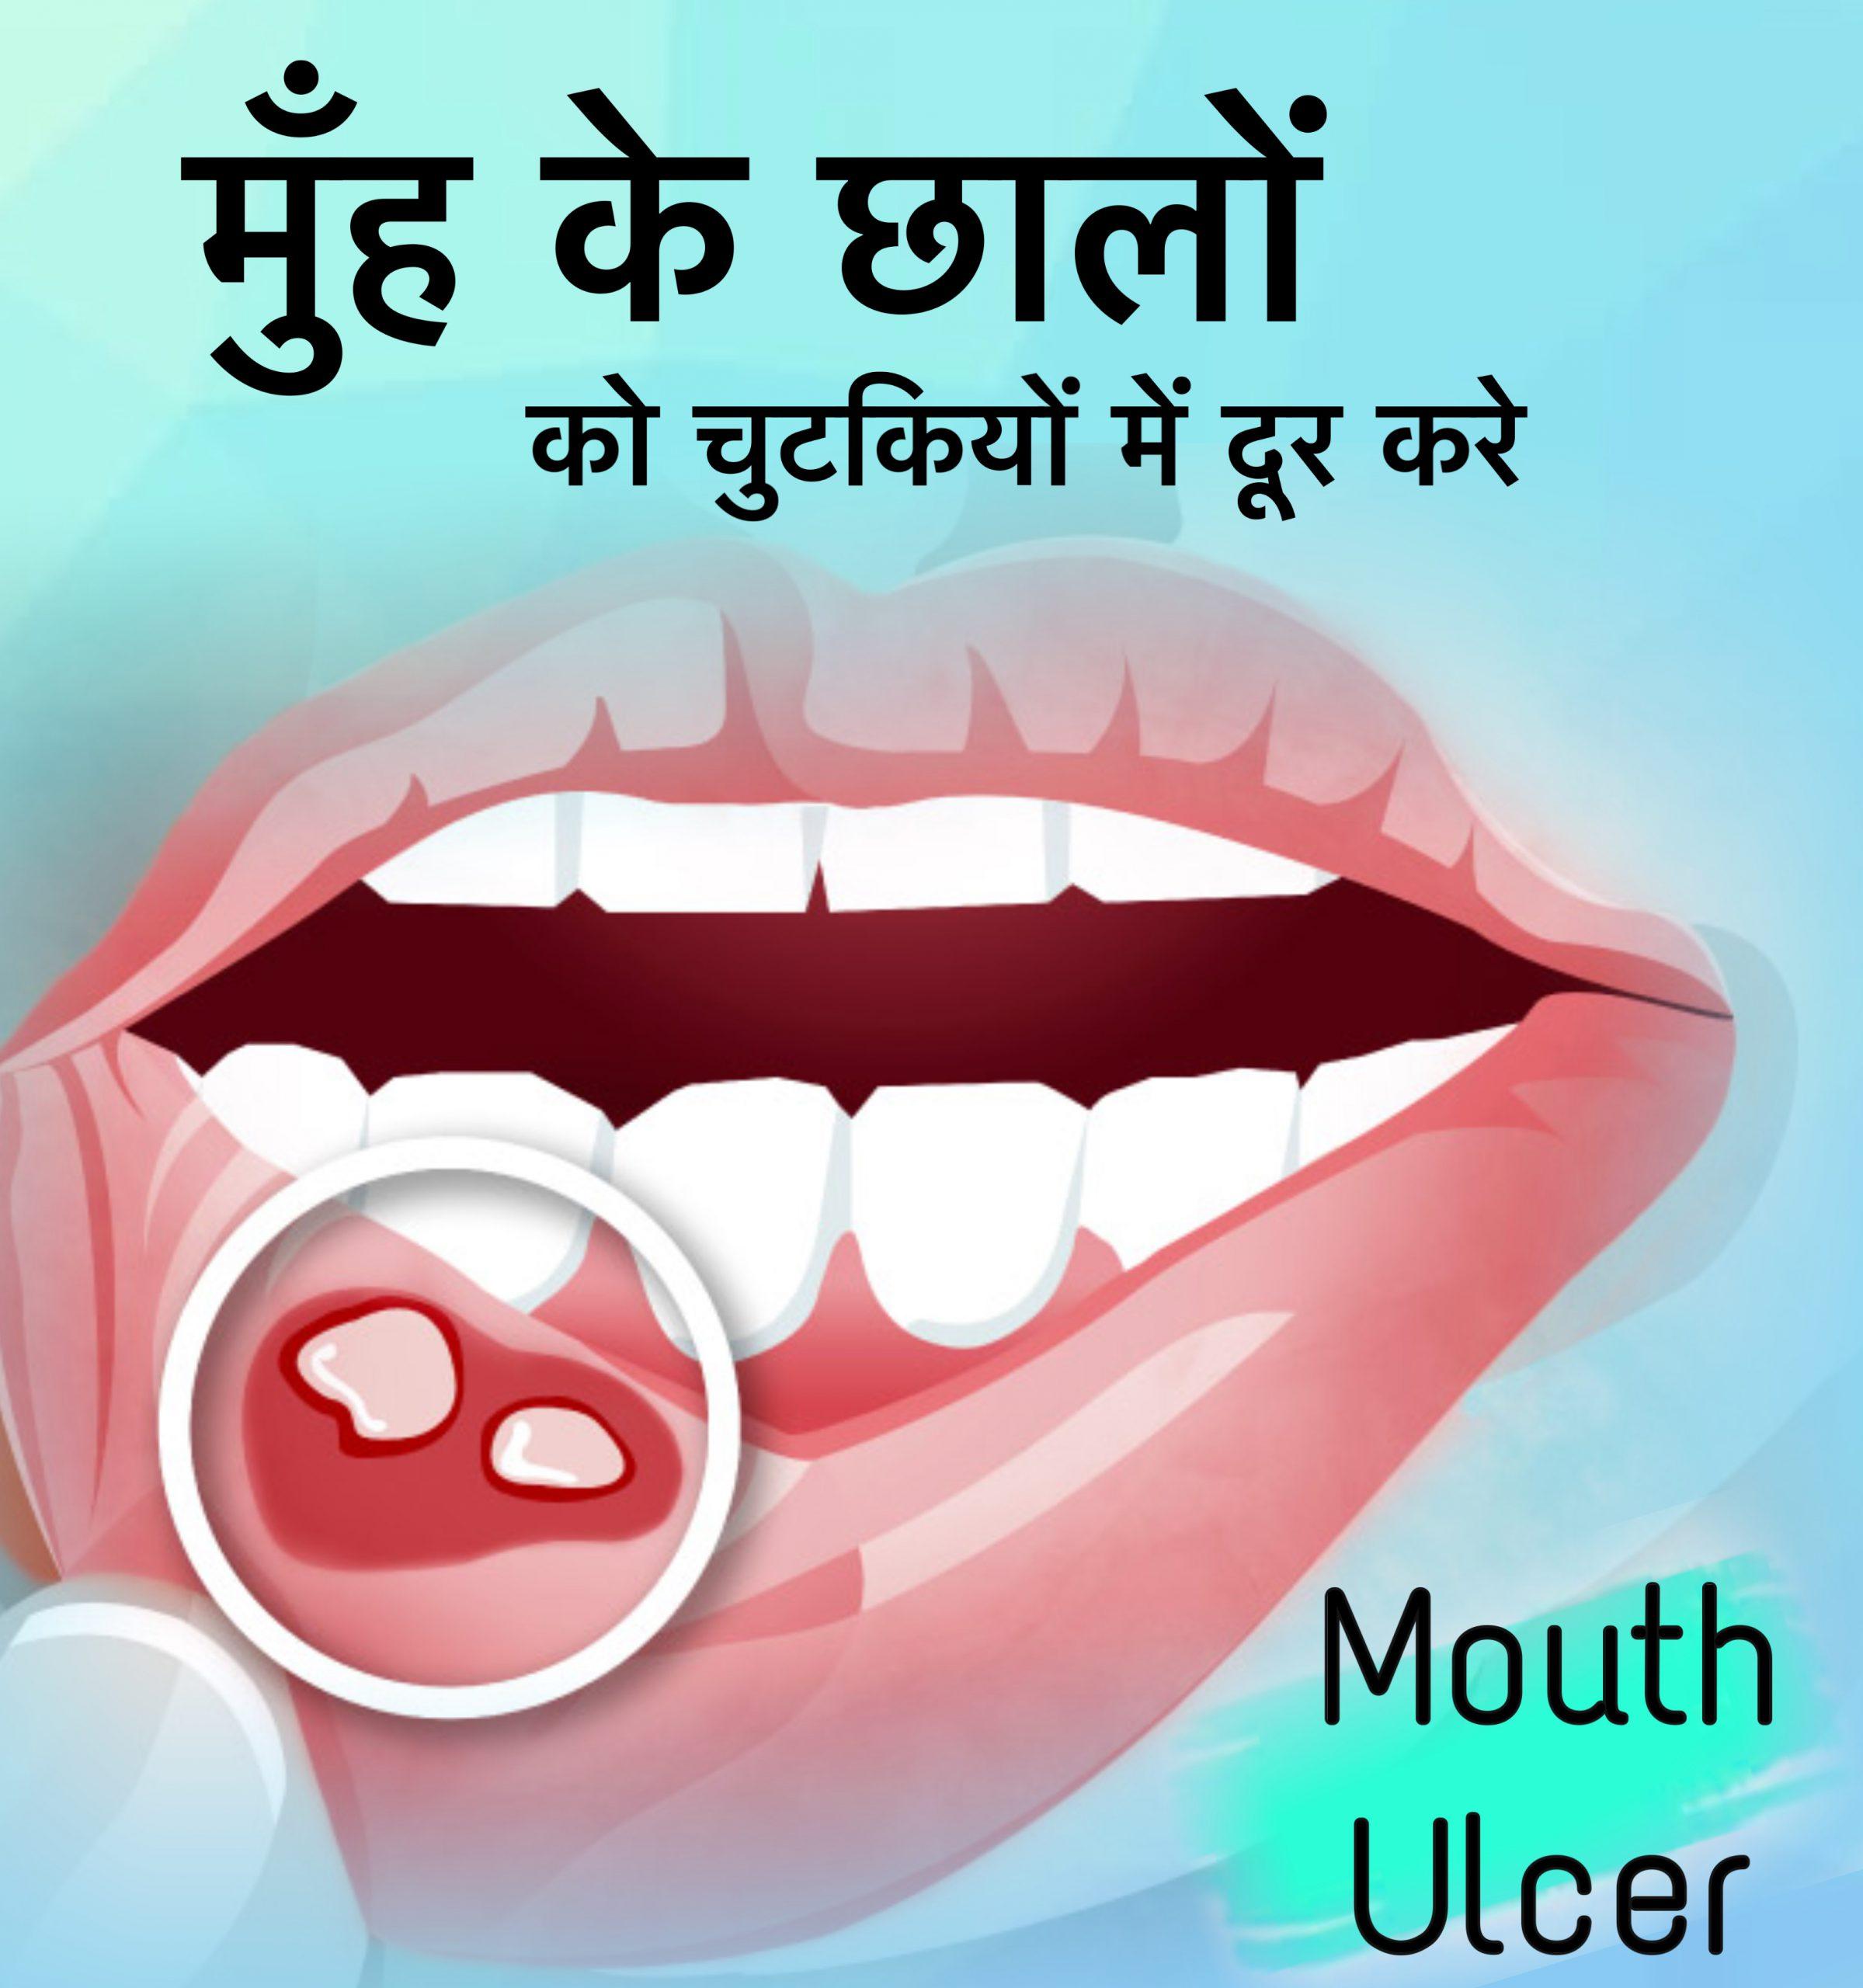 muh ke chhale (mouth ulcer)